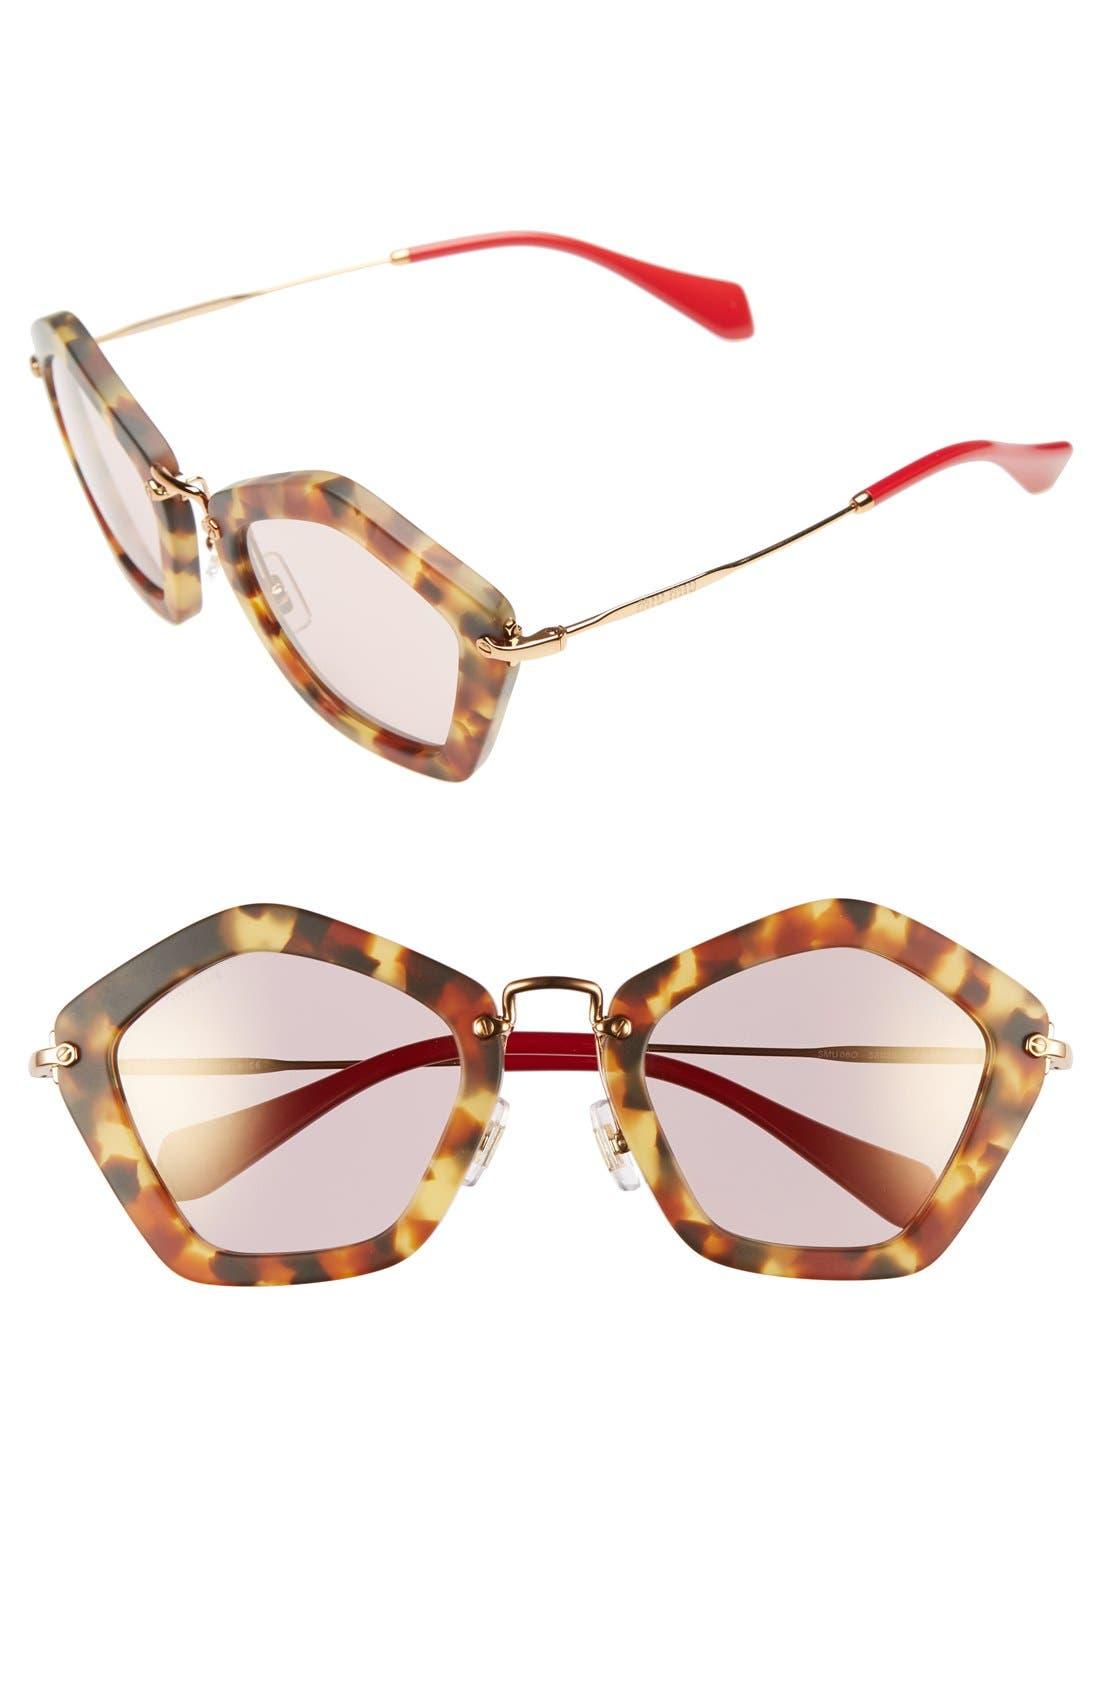 Alternate Image 1 Selected - Miu Miu 'Noir' 53mm Sunglasses